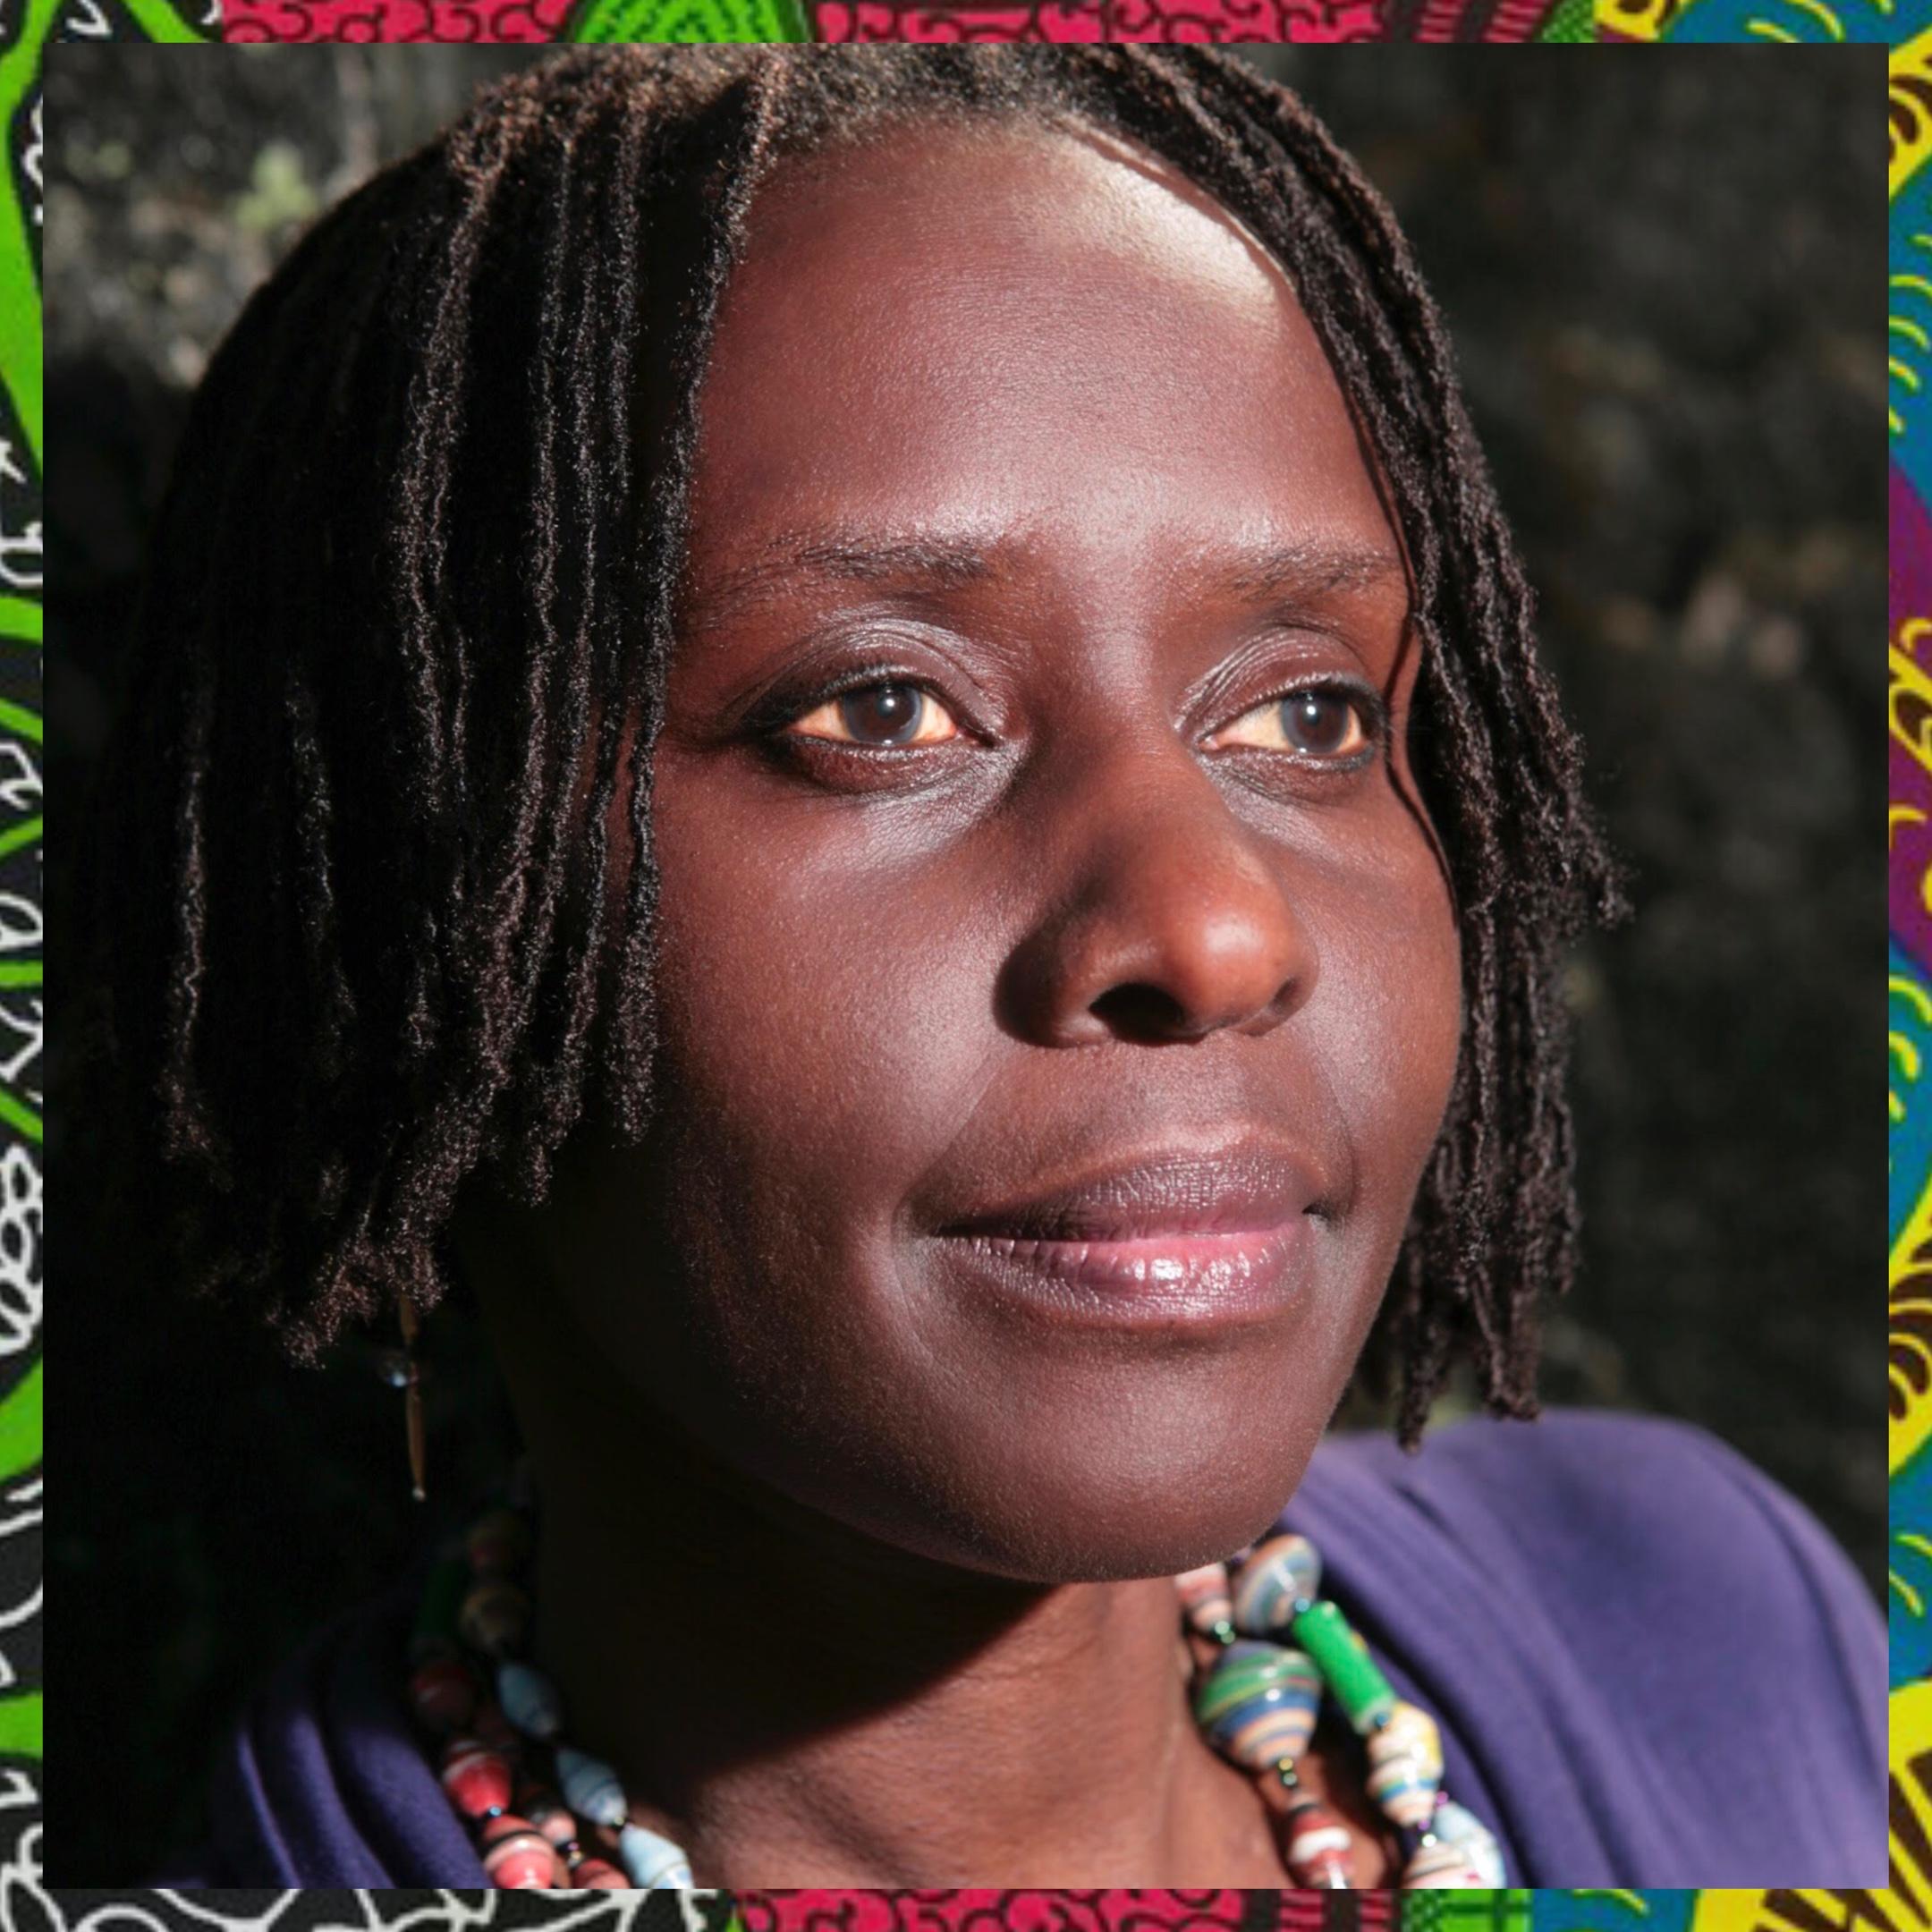 Award Wininng Poet, Writer and Scholar - JULIANE OKOT BITEK